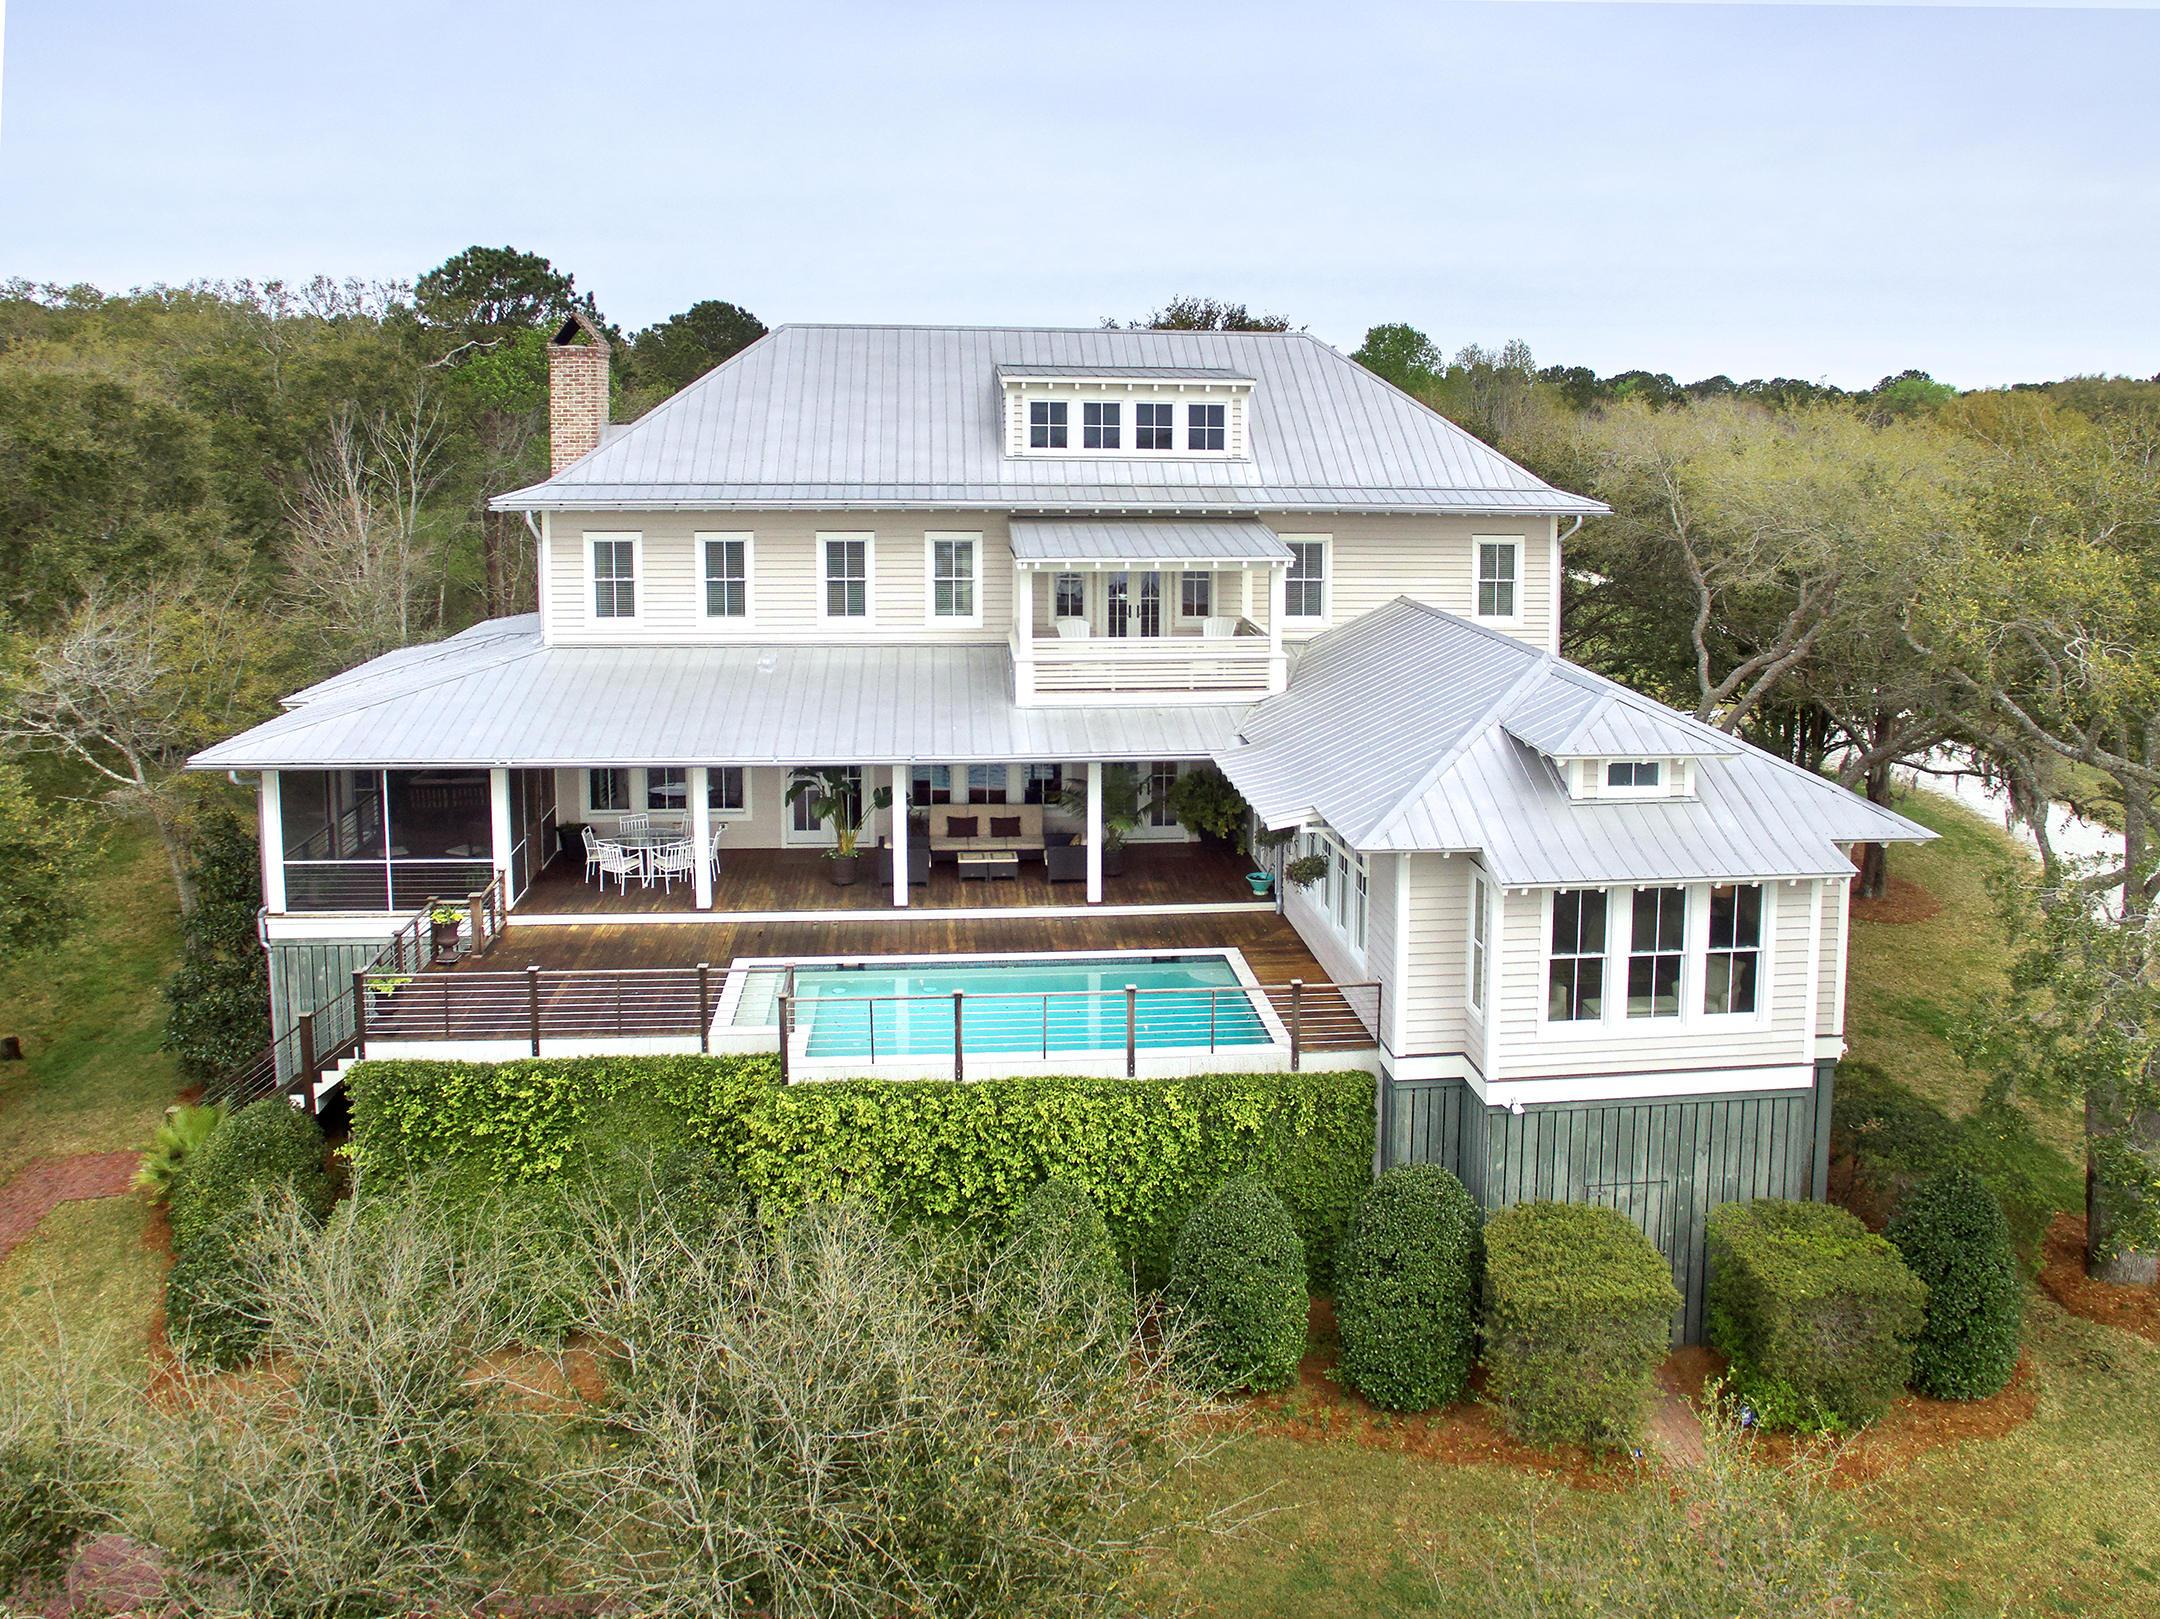 White Stalls Pt Jackson Homes For Sale - 625 Hall, Awendaw, SC - 46